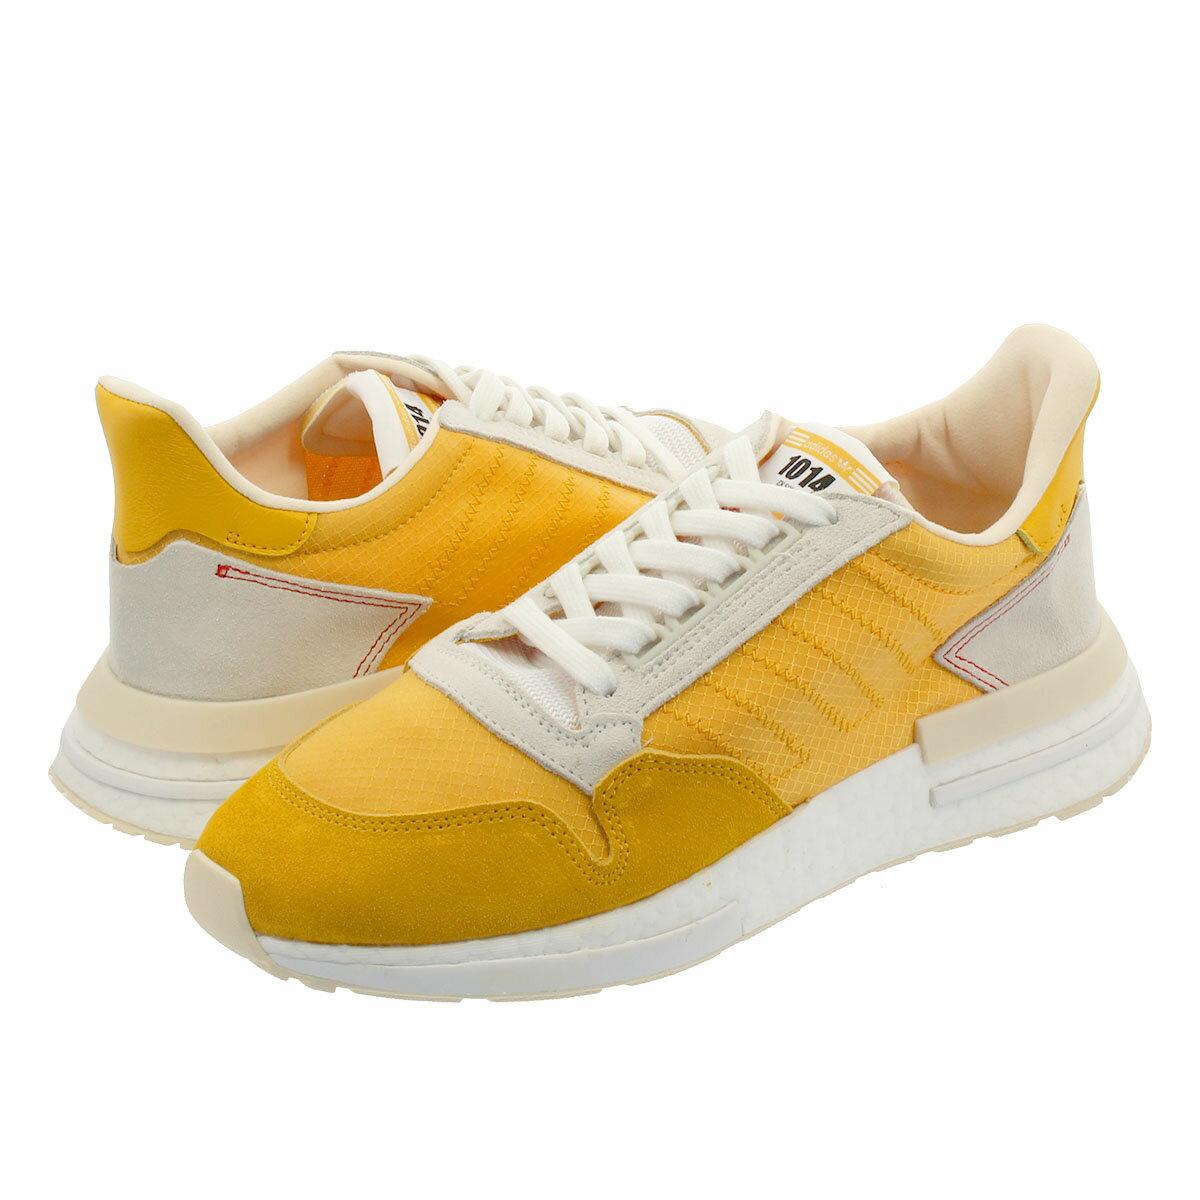 メンズ靴, スニーカー  adidas ZX 500 RM ZX 500 RM BOLD GOLDBOLD GOLDECRU cg6860